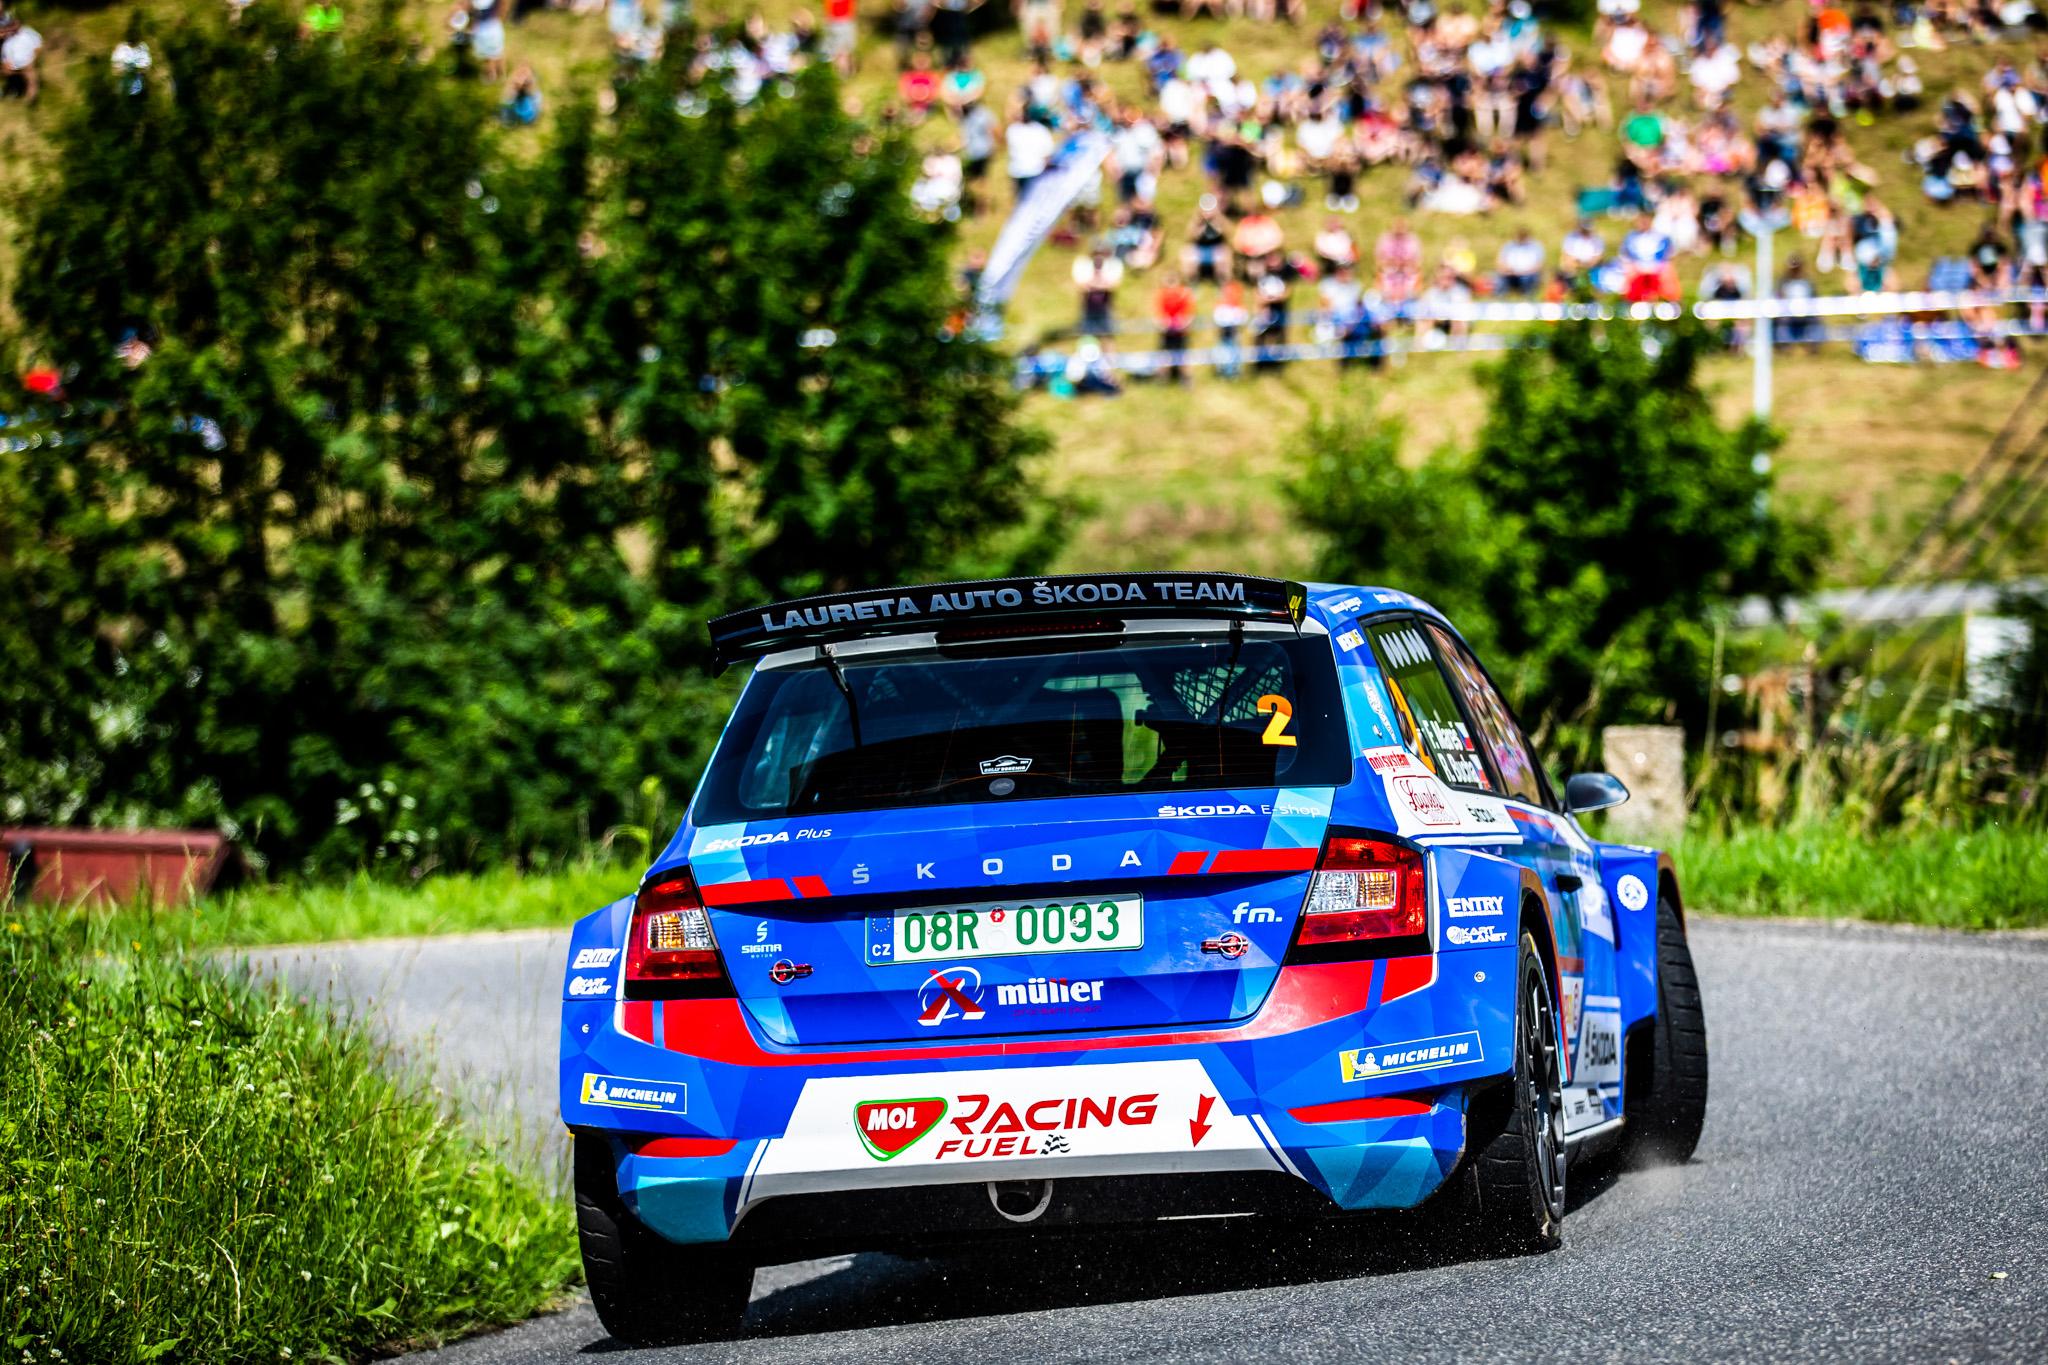 Jan Kopecký celebrates 120 years of SKODA in motorsport with ninth victory at Bohemia Rally - Image 4